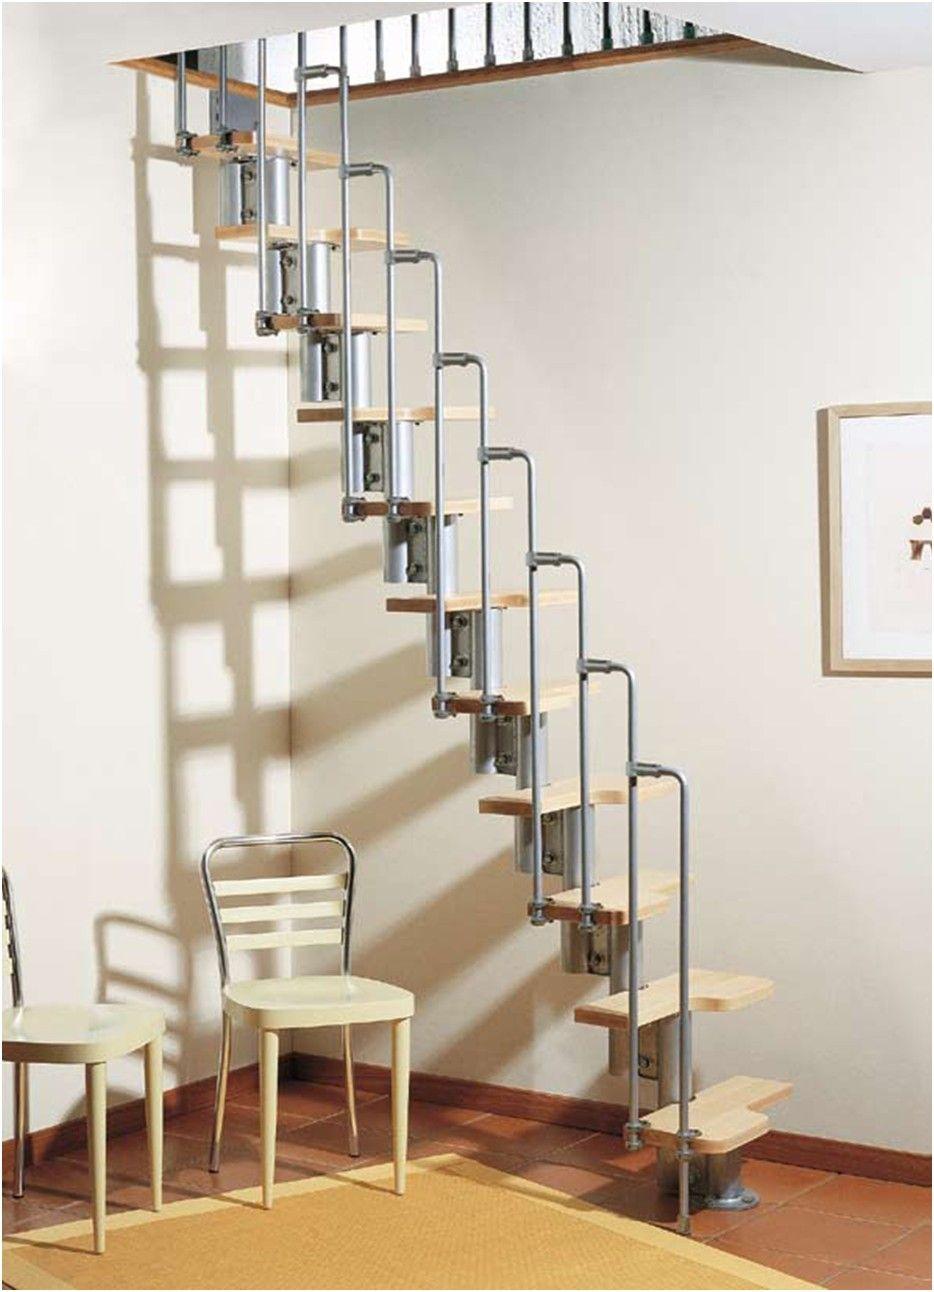 DIY Staircase Kits Online | Arke Stairs